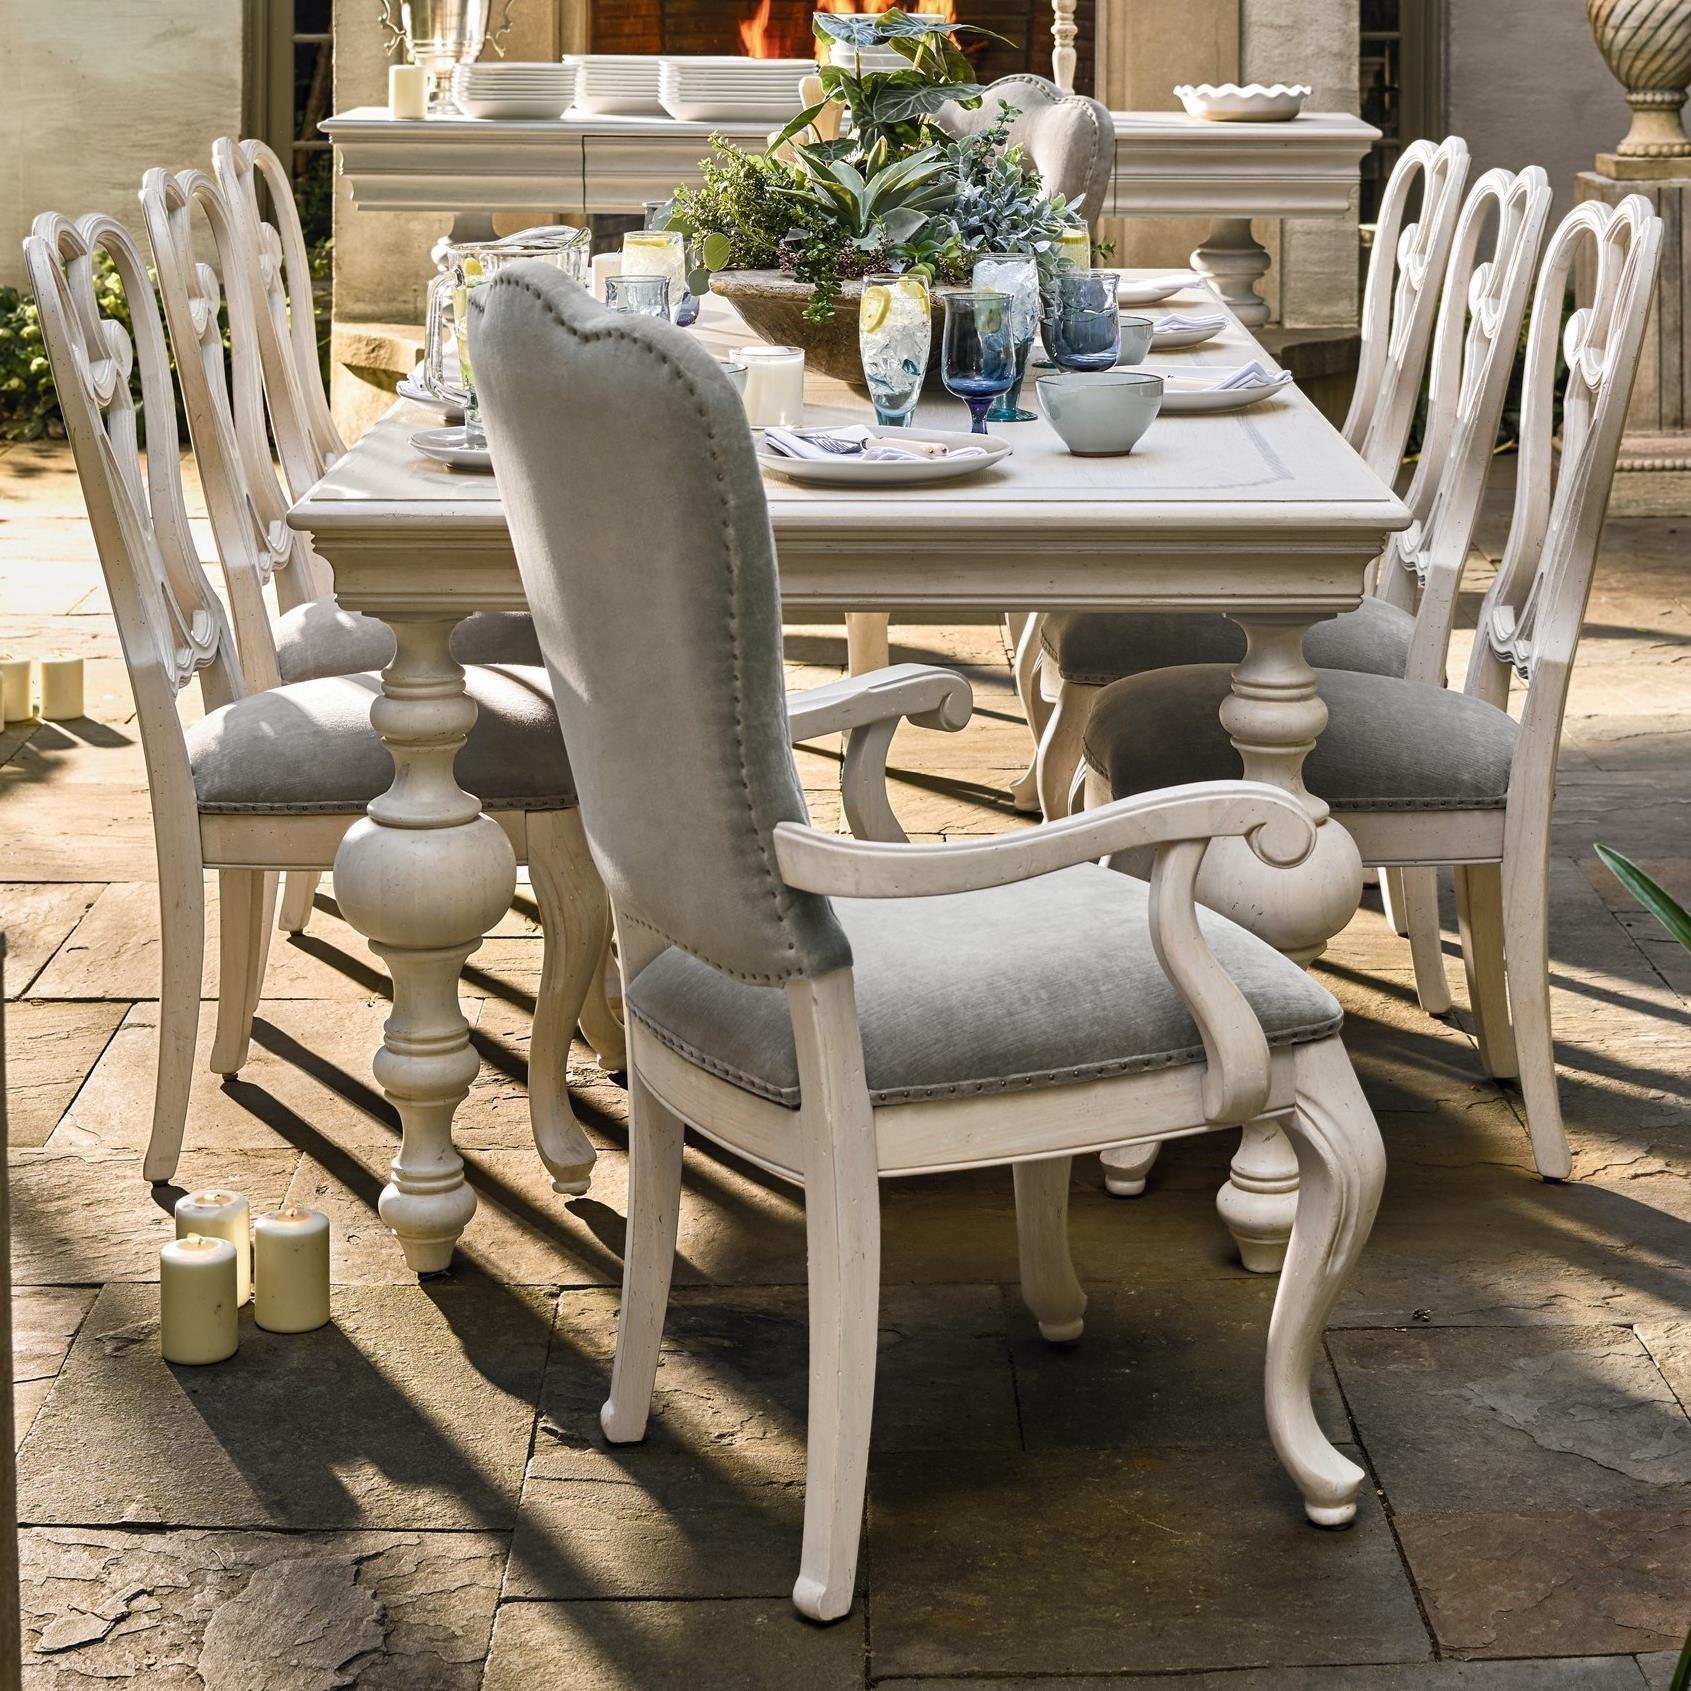 Morris Home Furnishings Élance Elance 5-Piece Dining Set - Item Number: 358466931